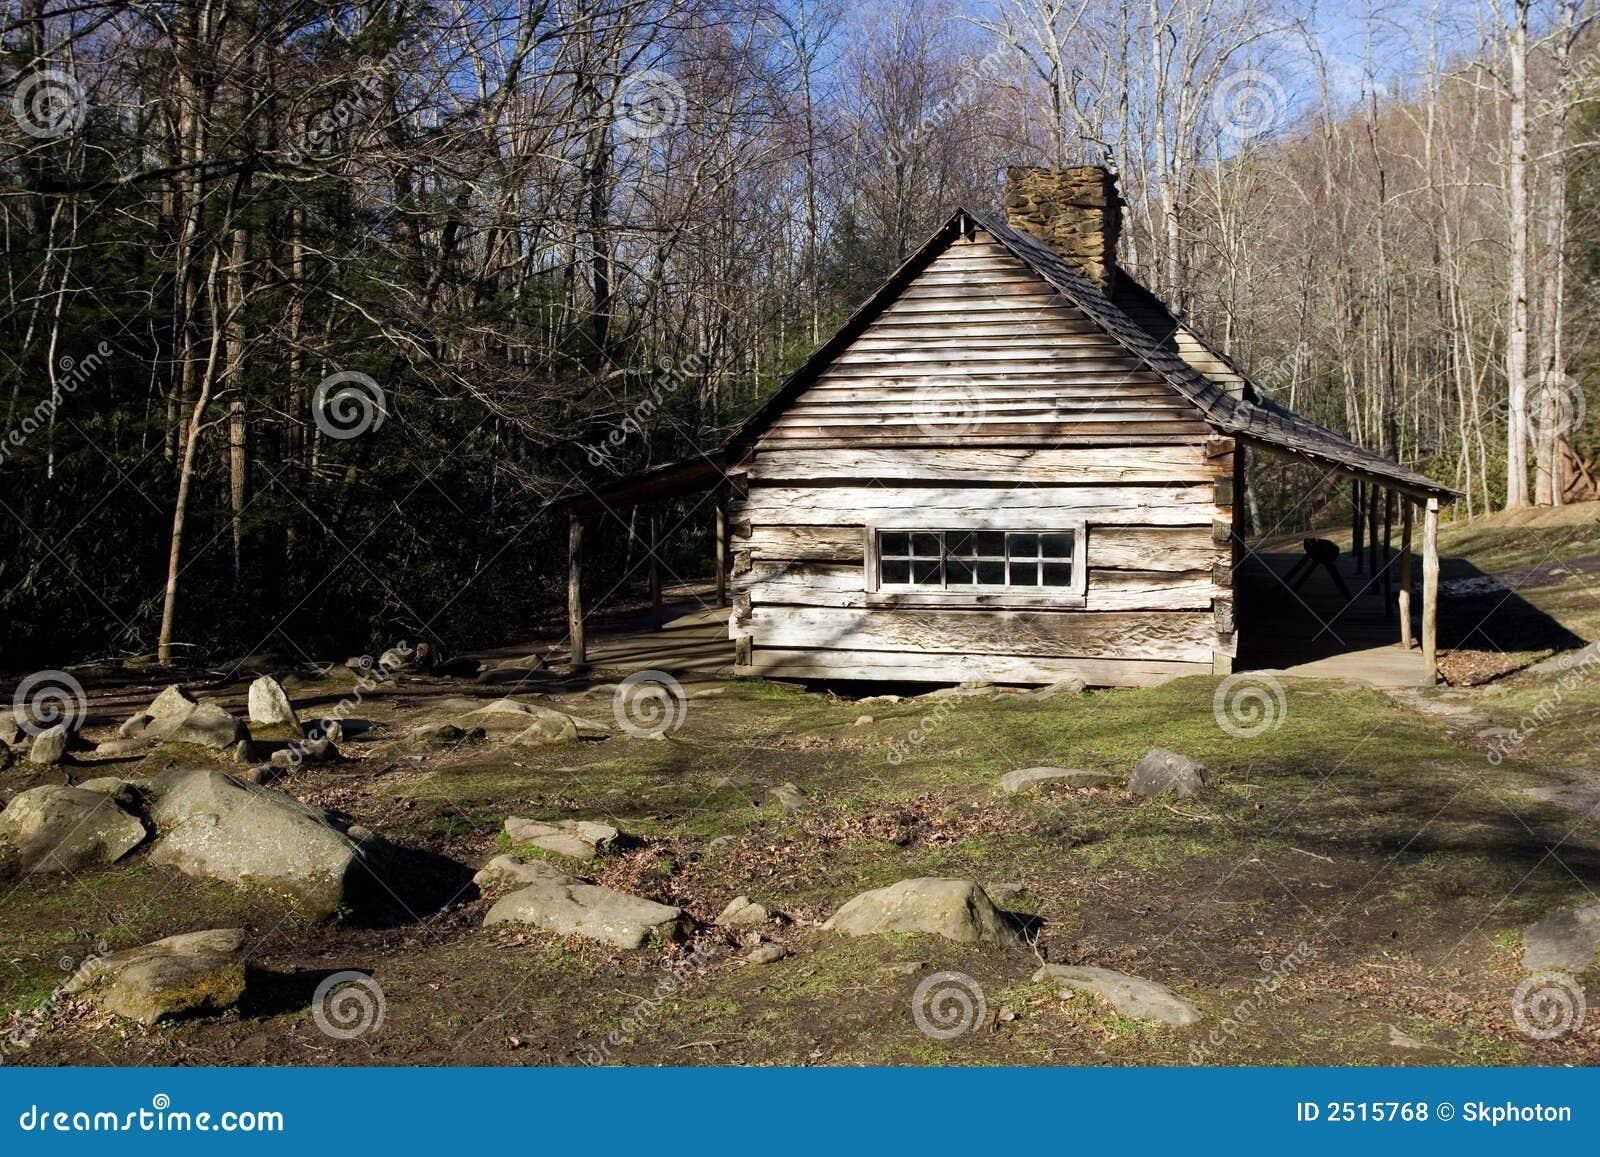 Log Cabin Royalty Free Stock Photos Image 2515768